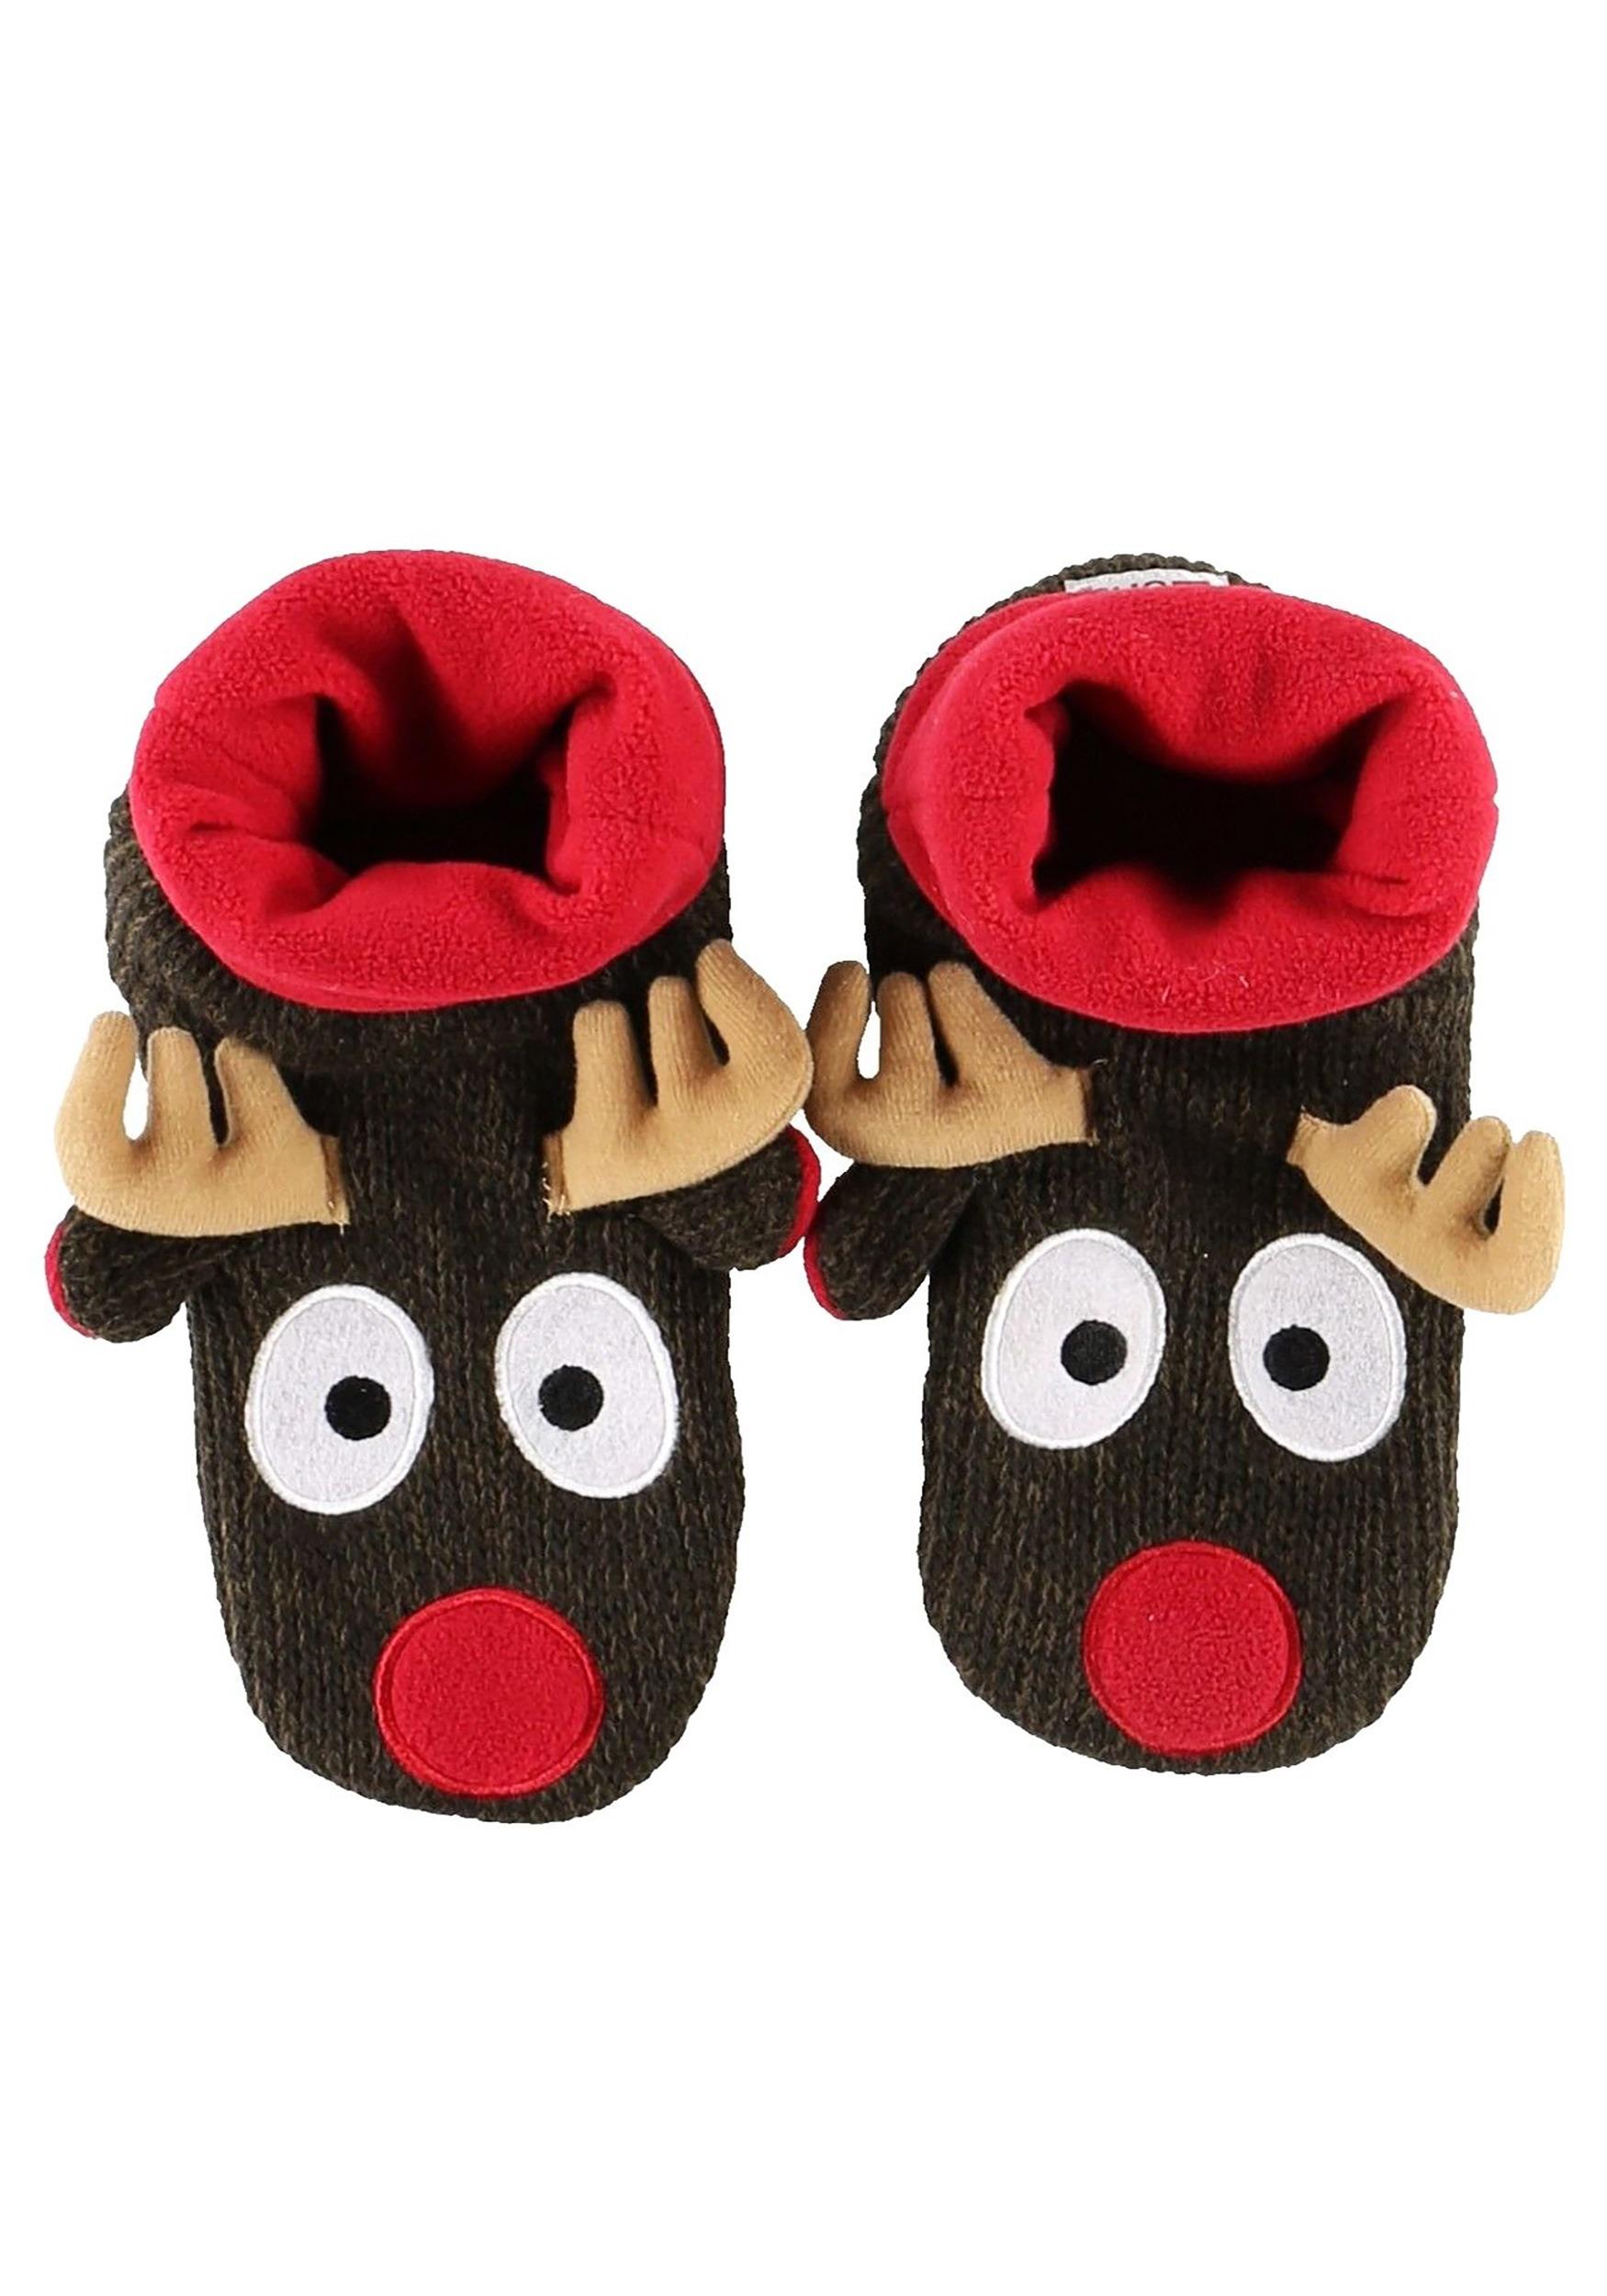 8d2f1d28394 Reindeer Woodland Adult Slippers